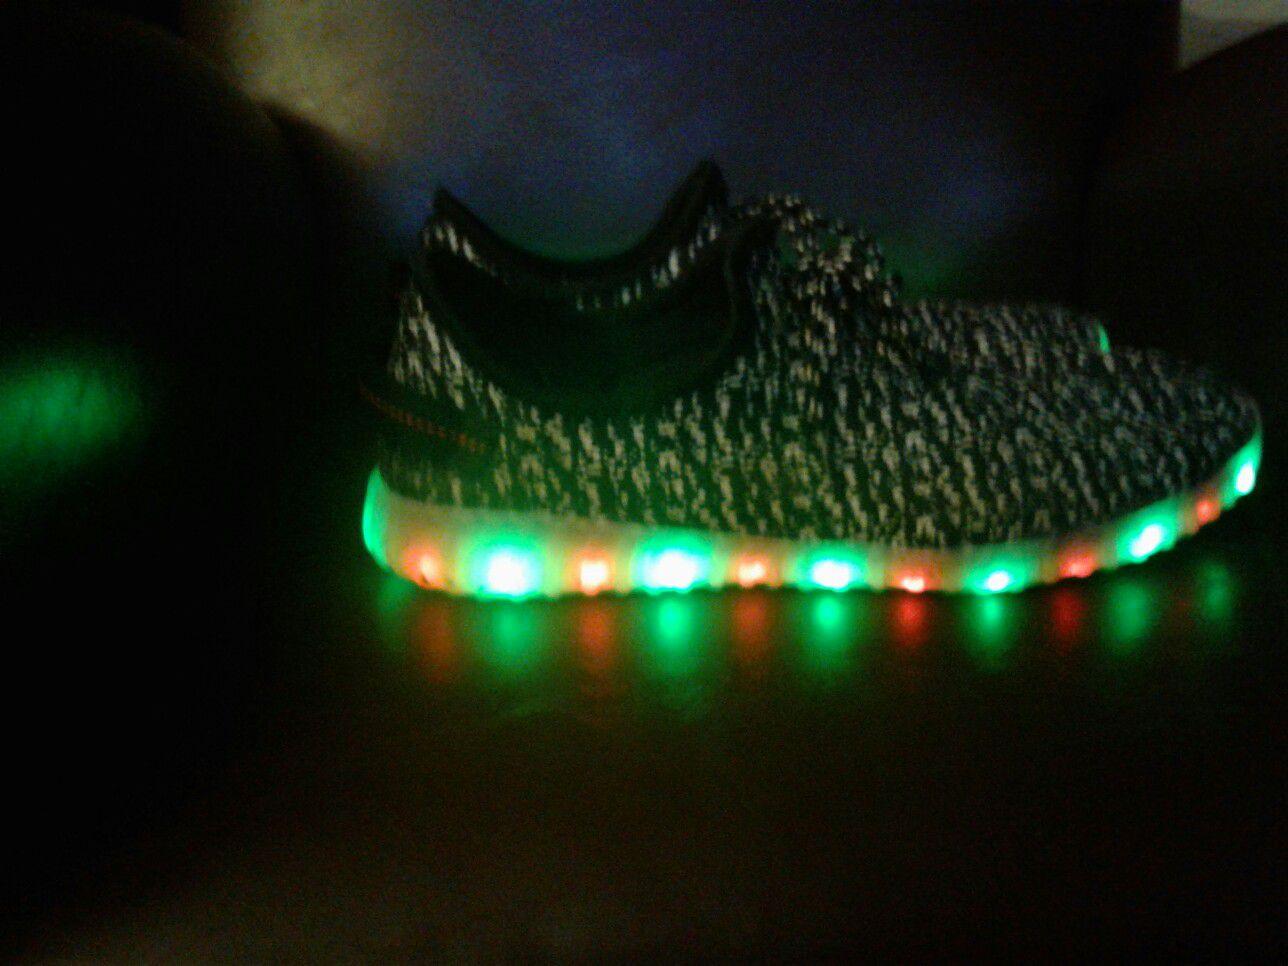 Coolest shoes ever